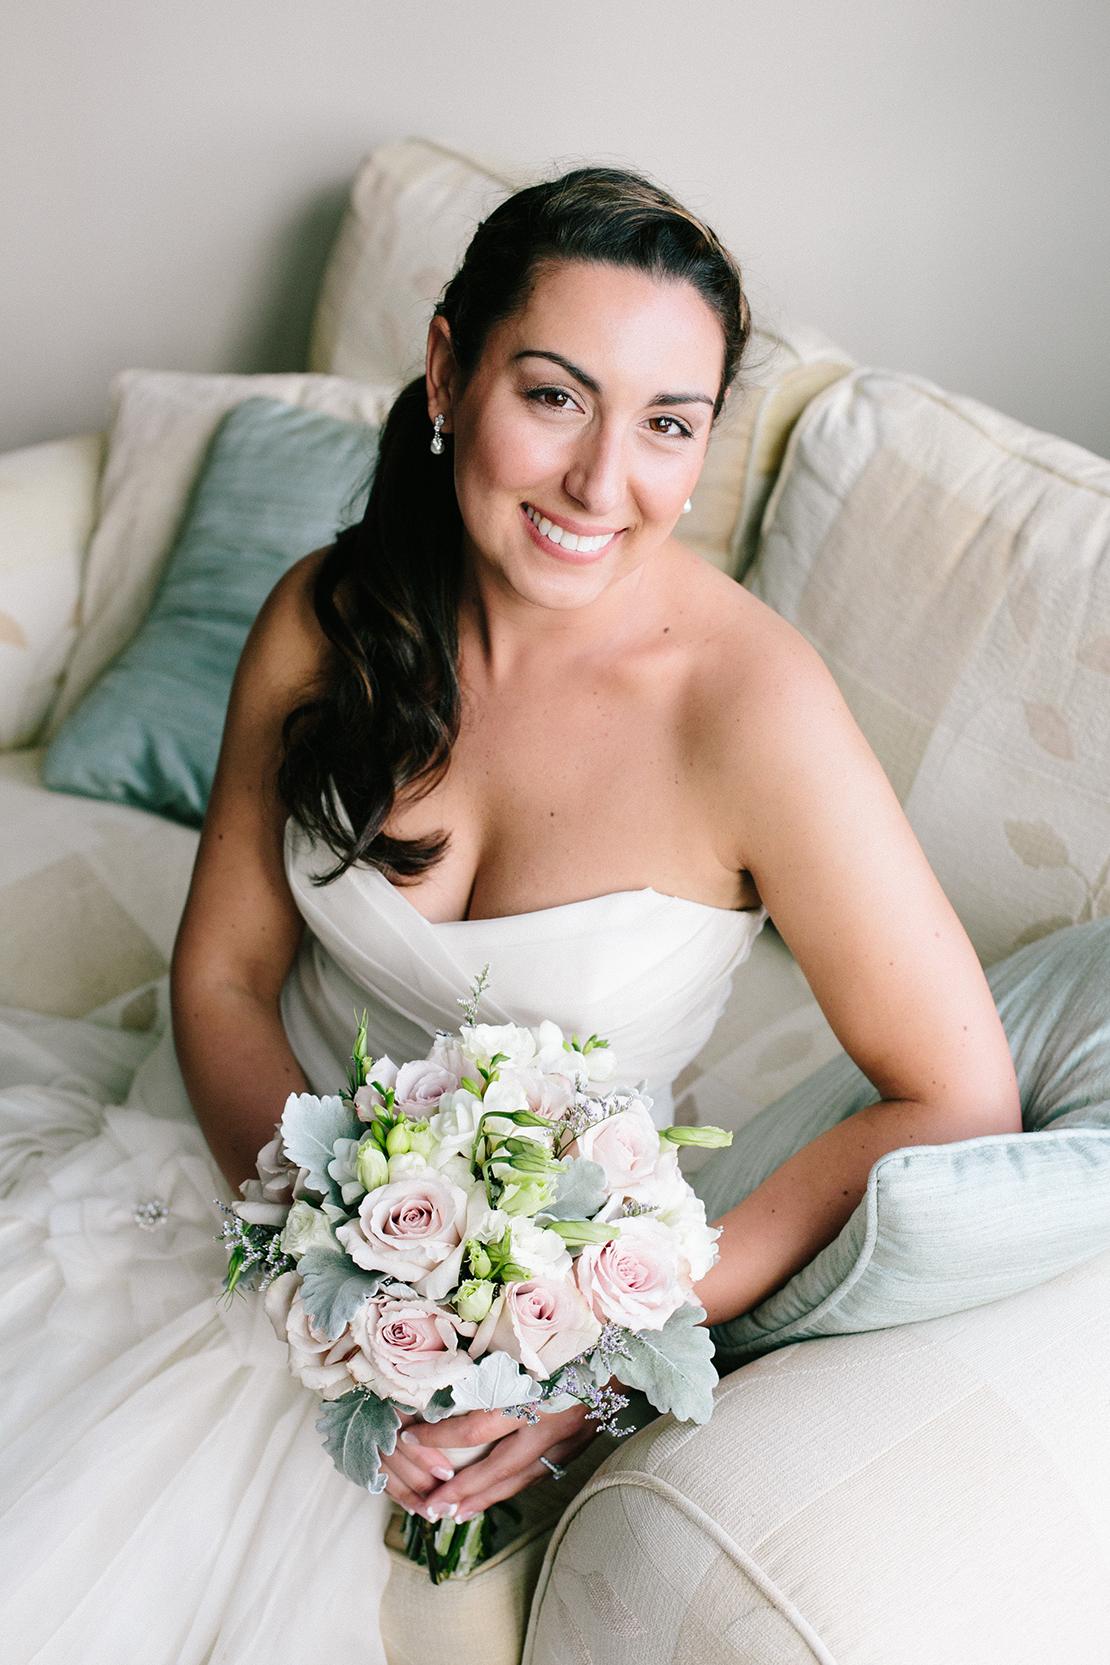 06a_Heidi_Vail_photography_wedding-provincetown_cape_cod_bridal_portrait